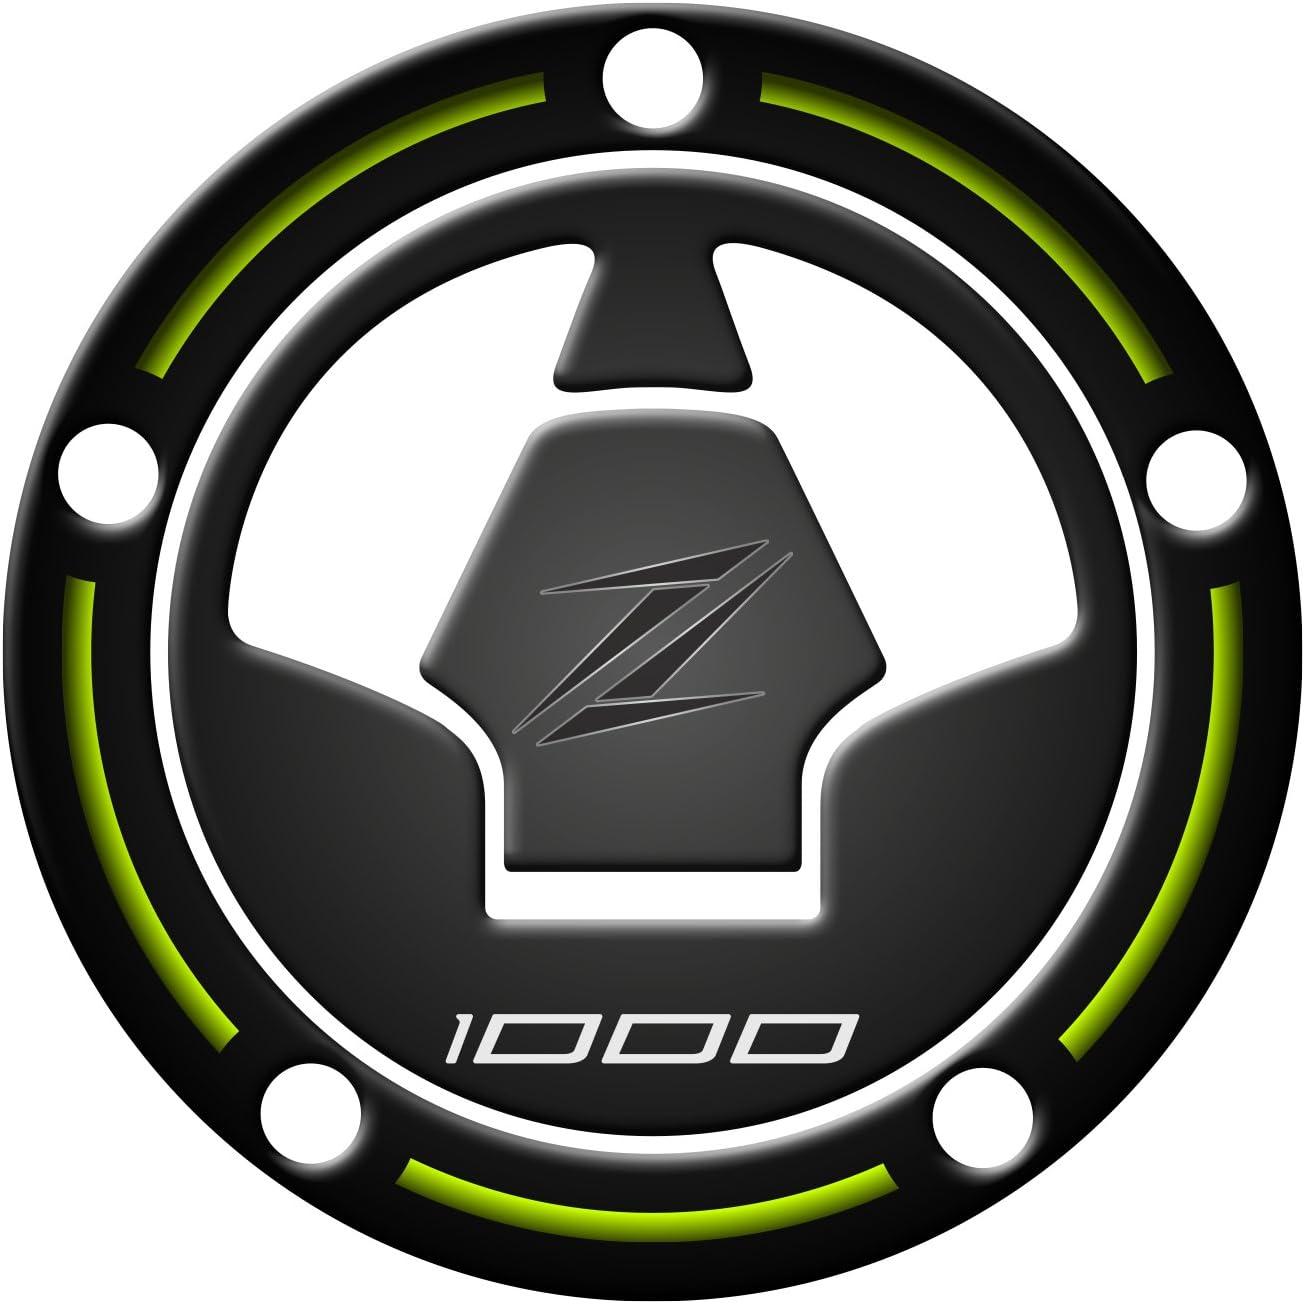 PARA Zip rot Fuel Cap Protector Schutz St/öpsel Benzin geharzt 3d f/ür Motorr/äder Kawasaki Z1000/2010/ /2017/gp-396/